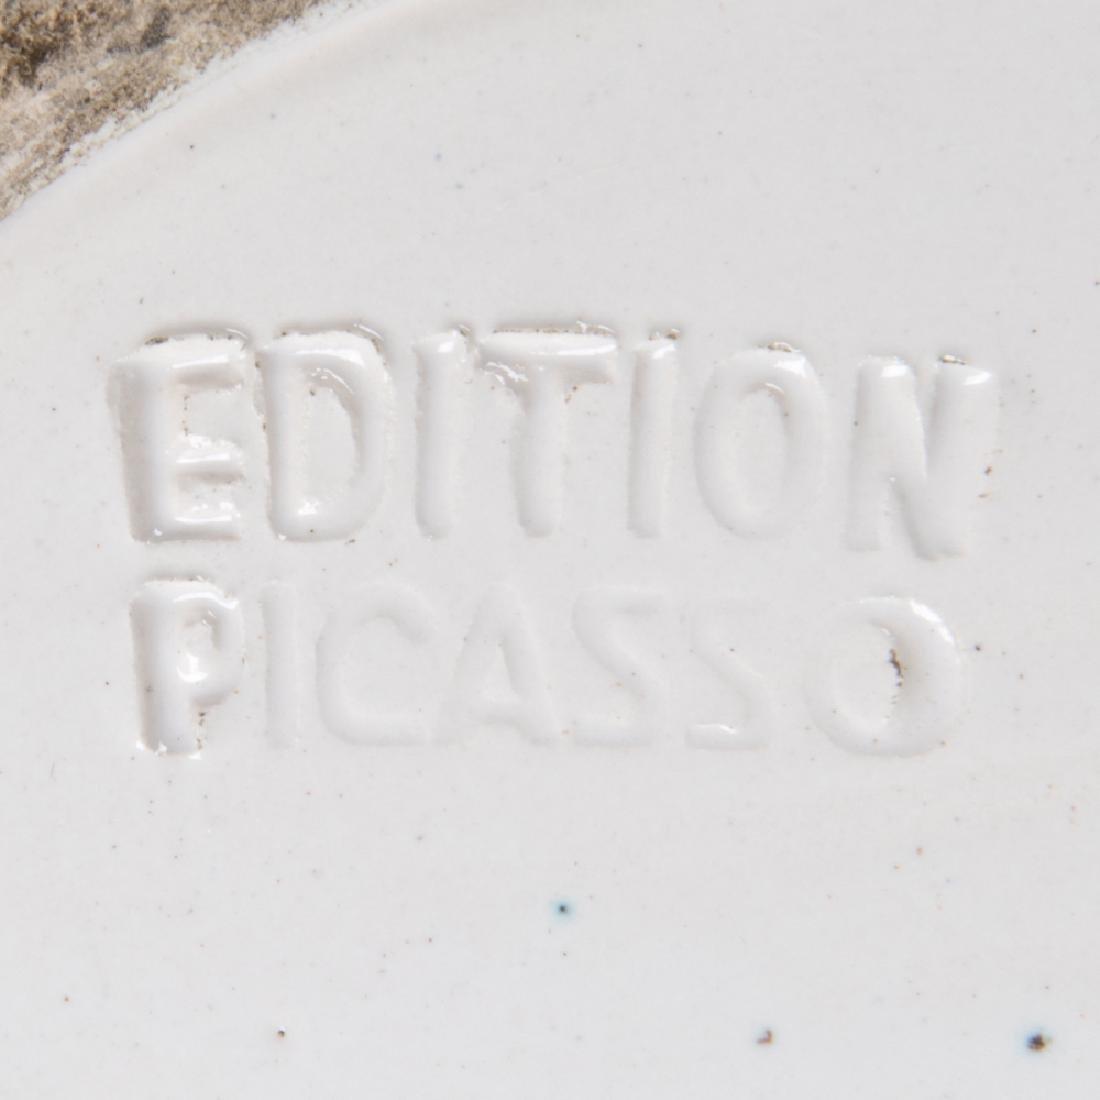 Pablo Picasso (1881-1973) Pichet Tetes, 1956, White - 6